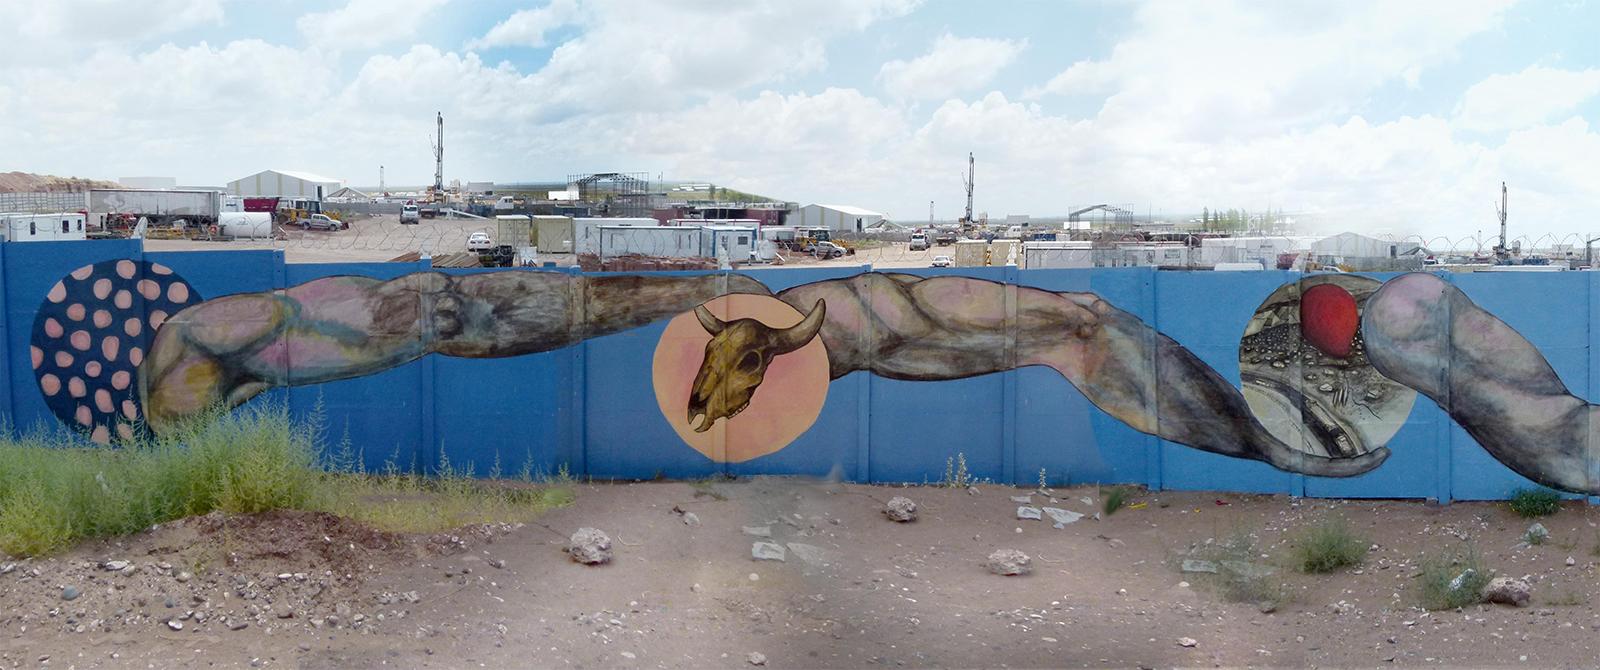 plumas-new-mural-in-neuquen-argentina-09